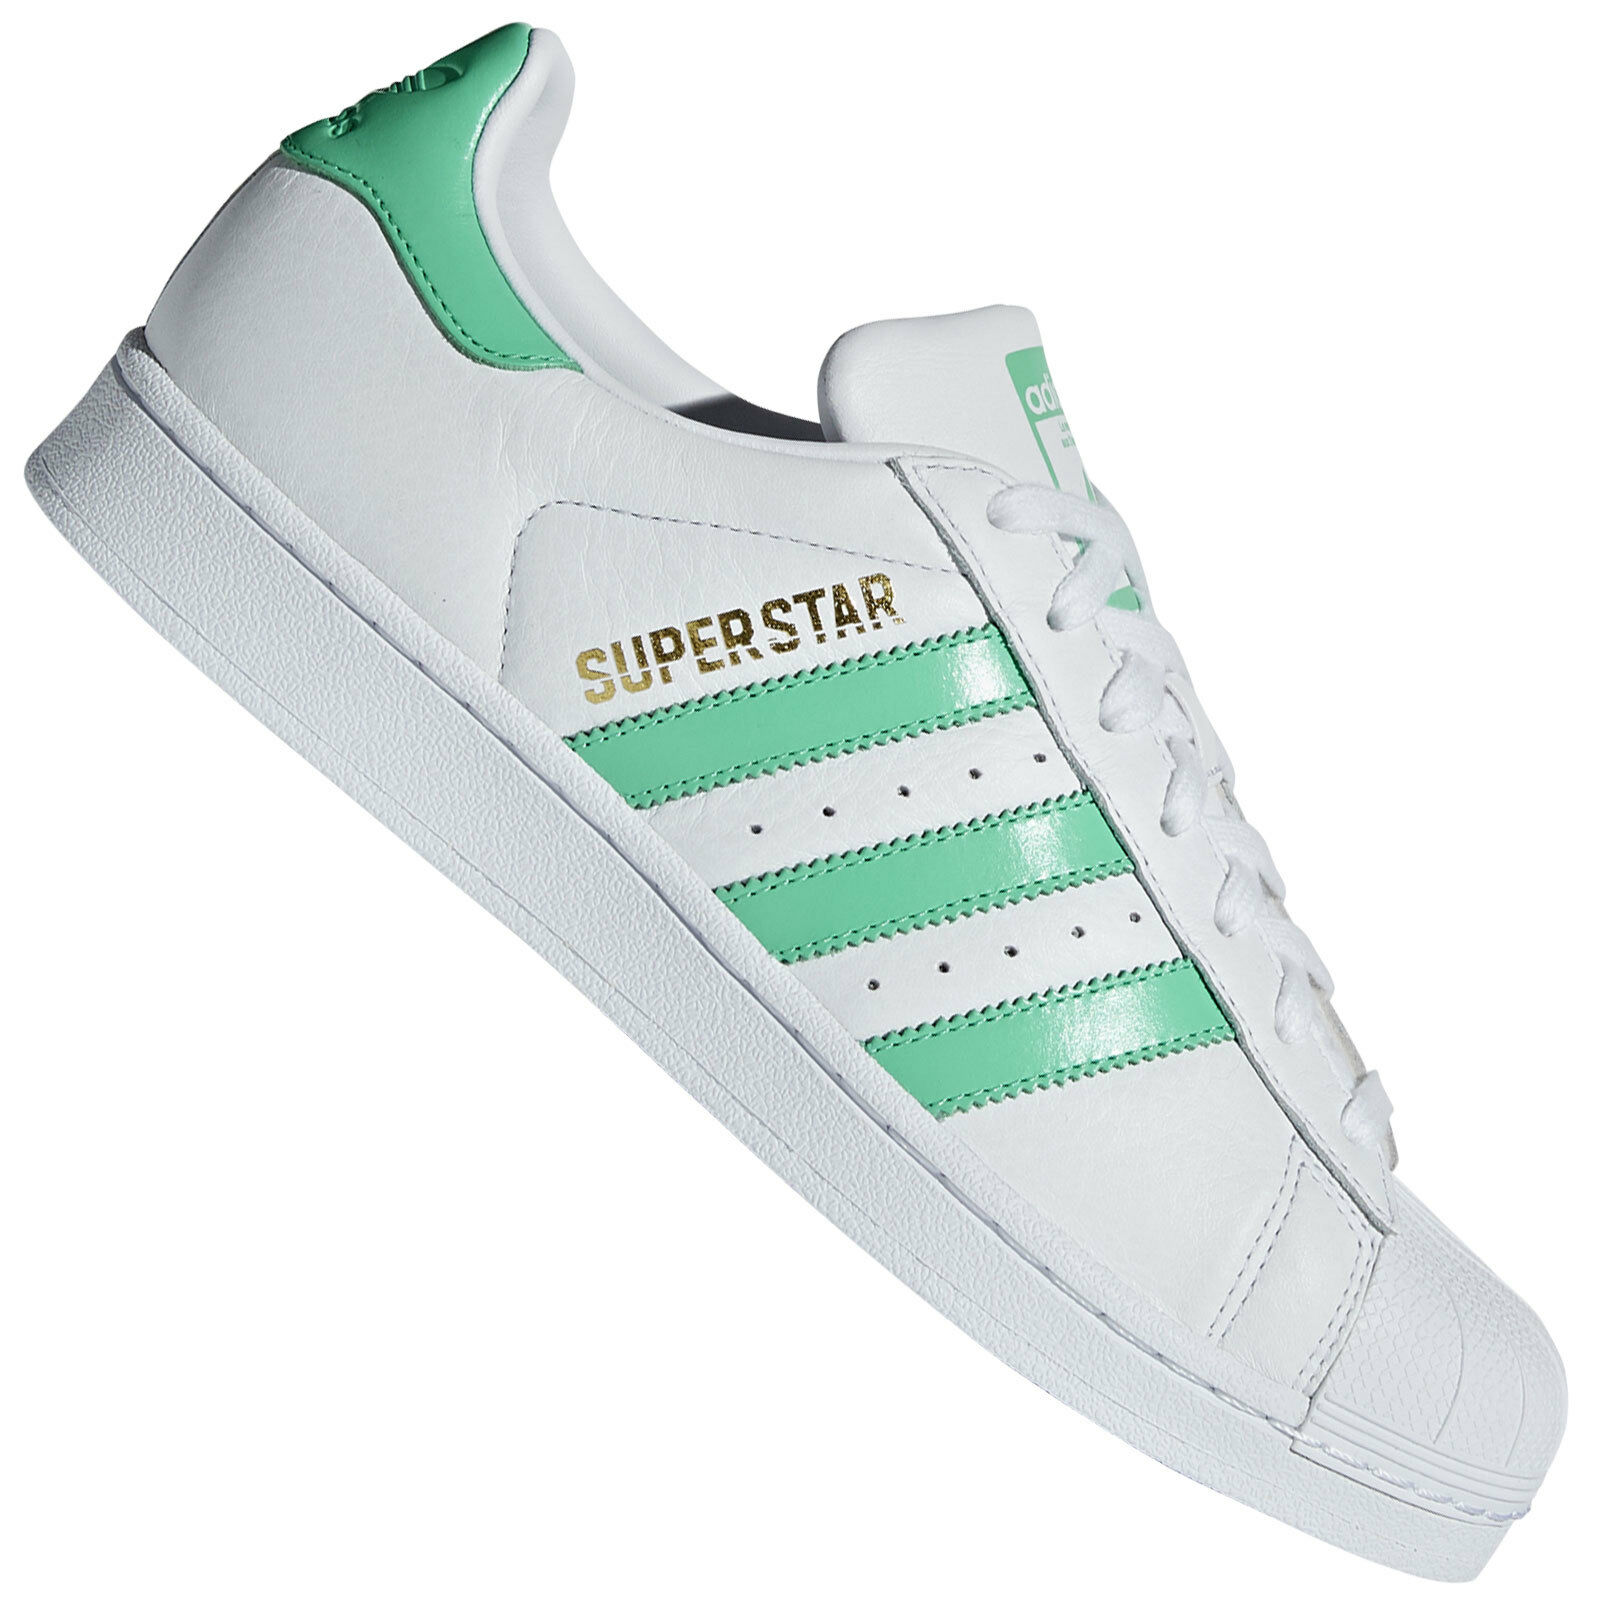 Adidas Originals Superstar Chaussures de Sport Baskets Baskets Baskets Homme Chaussures,Coloris 3cafe7